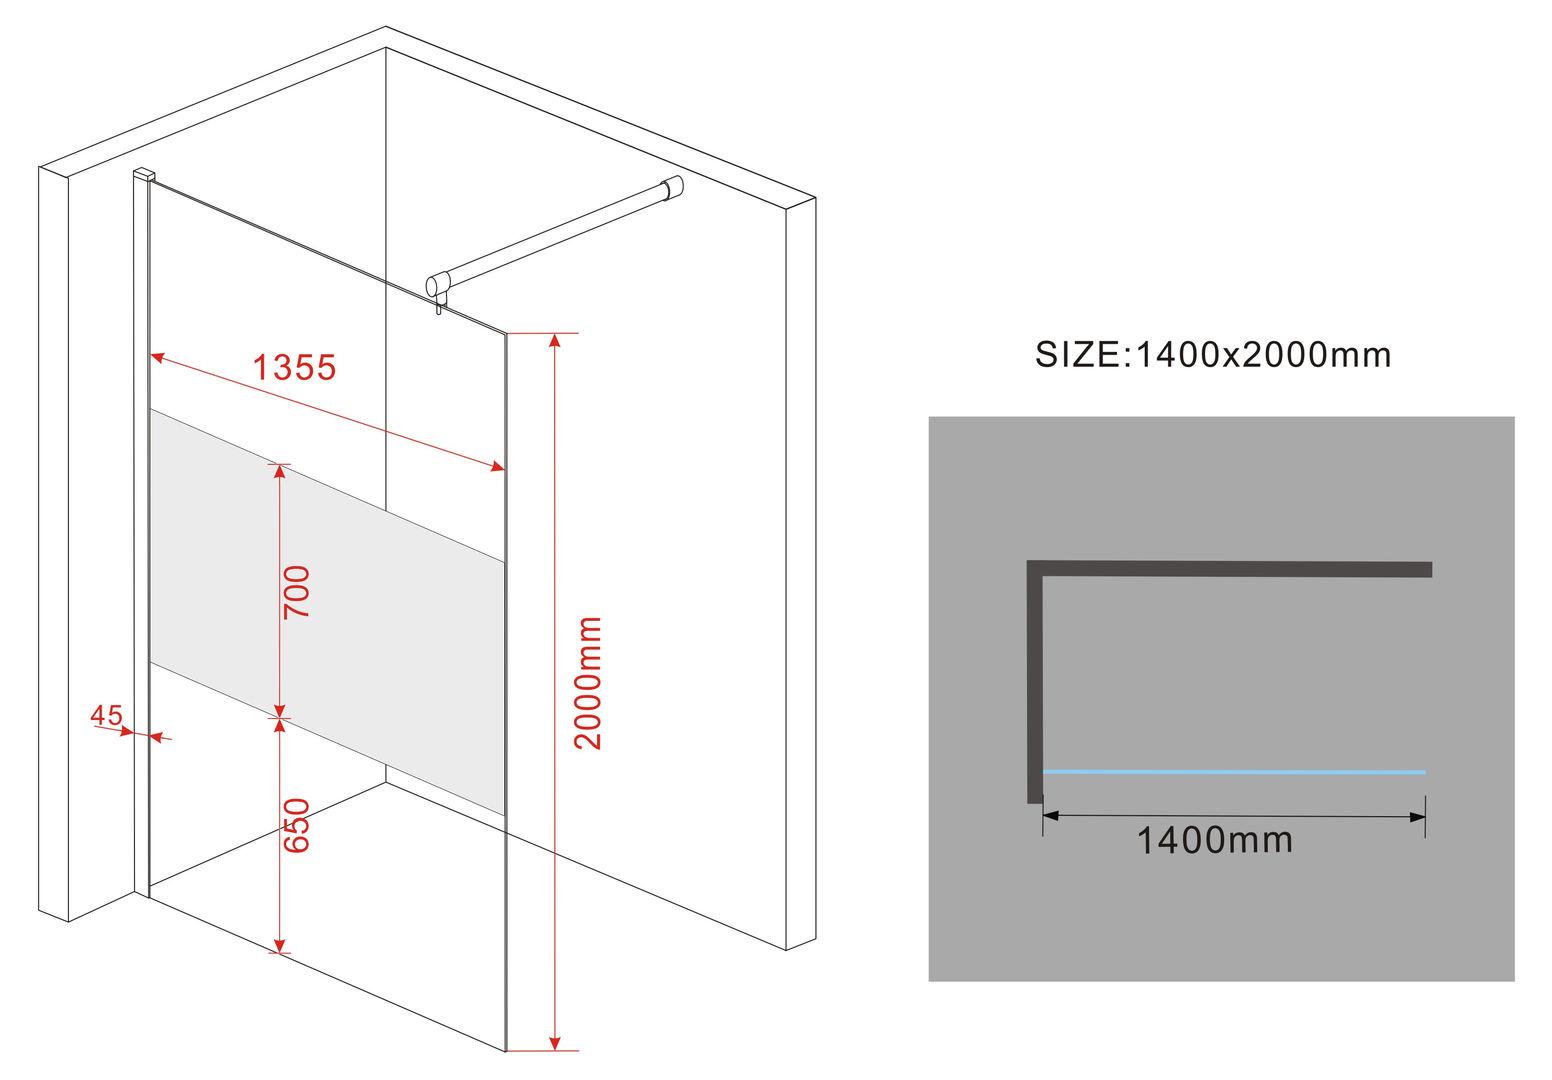 vacante fr 10mm duschwand glas walk in dusche duschkabine. Black Bedroom Furniture Sets. Home Design Ideas